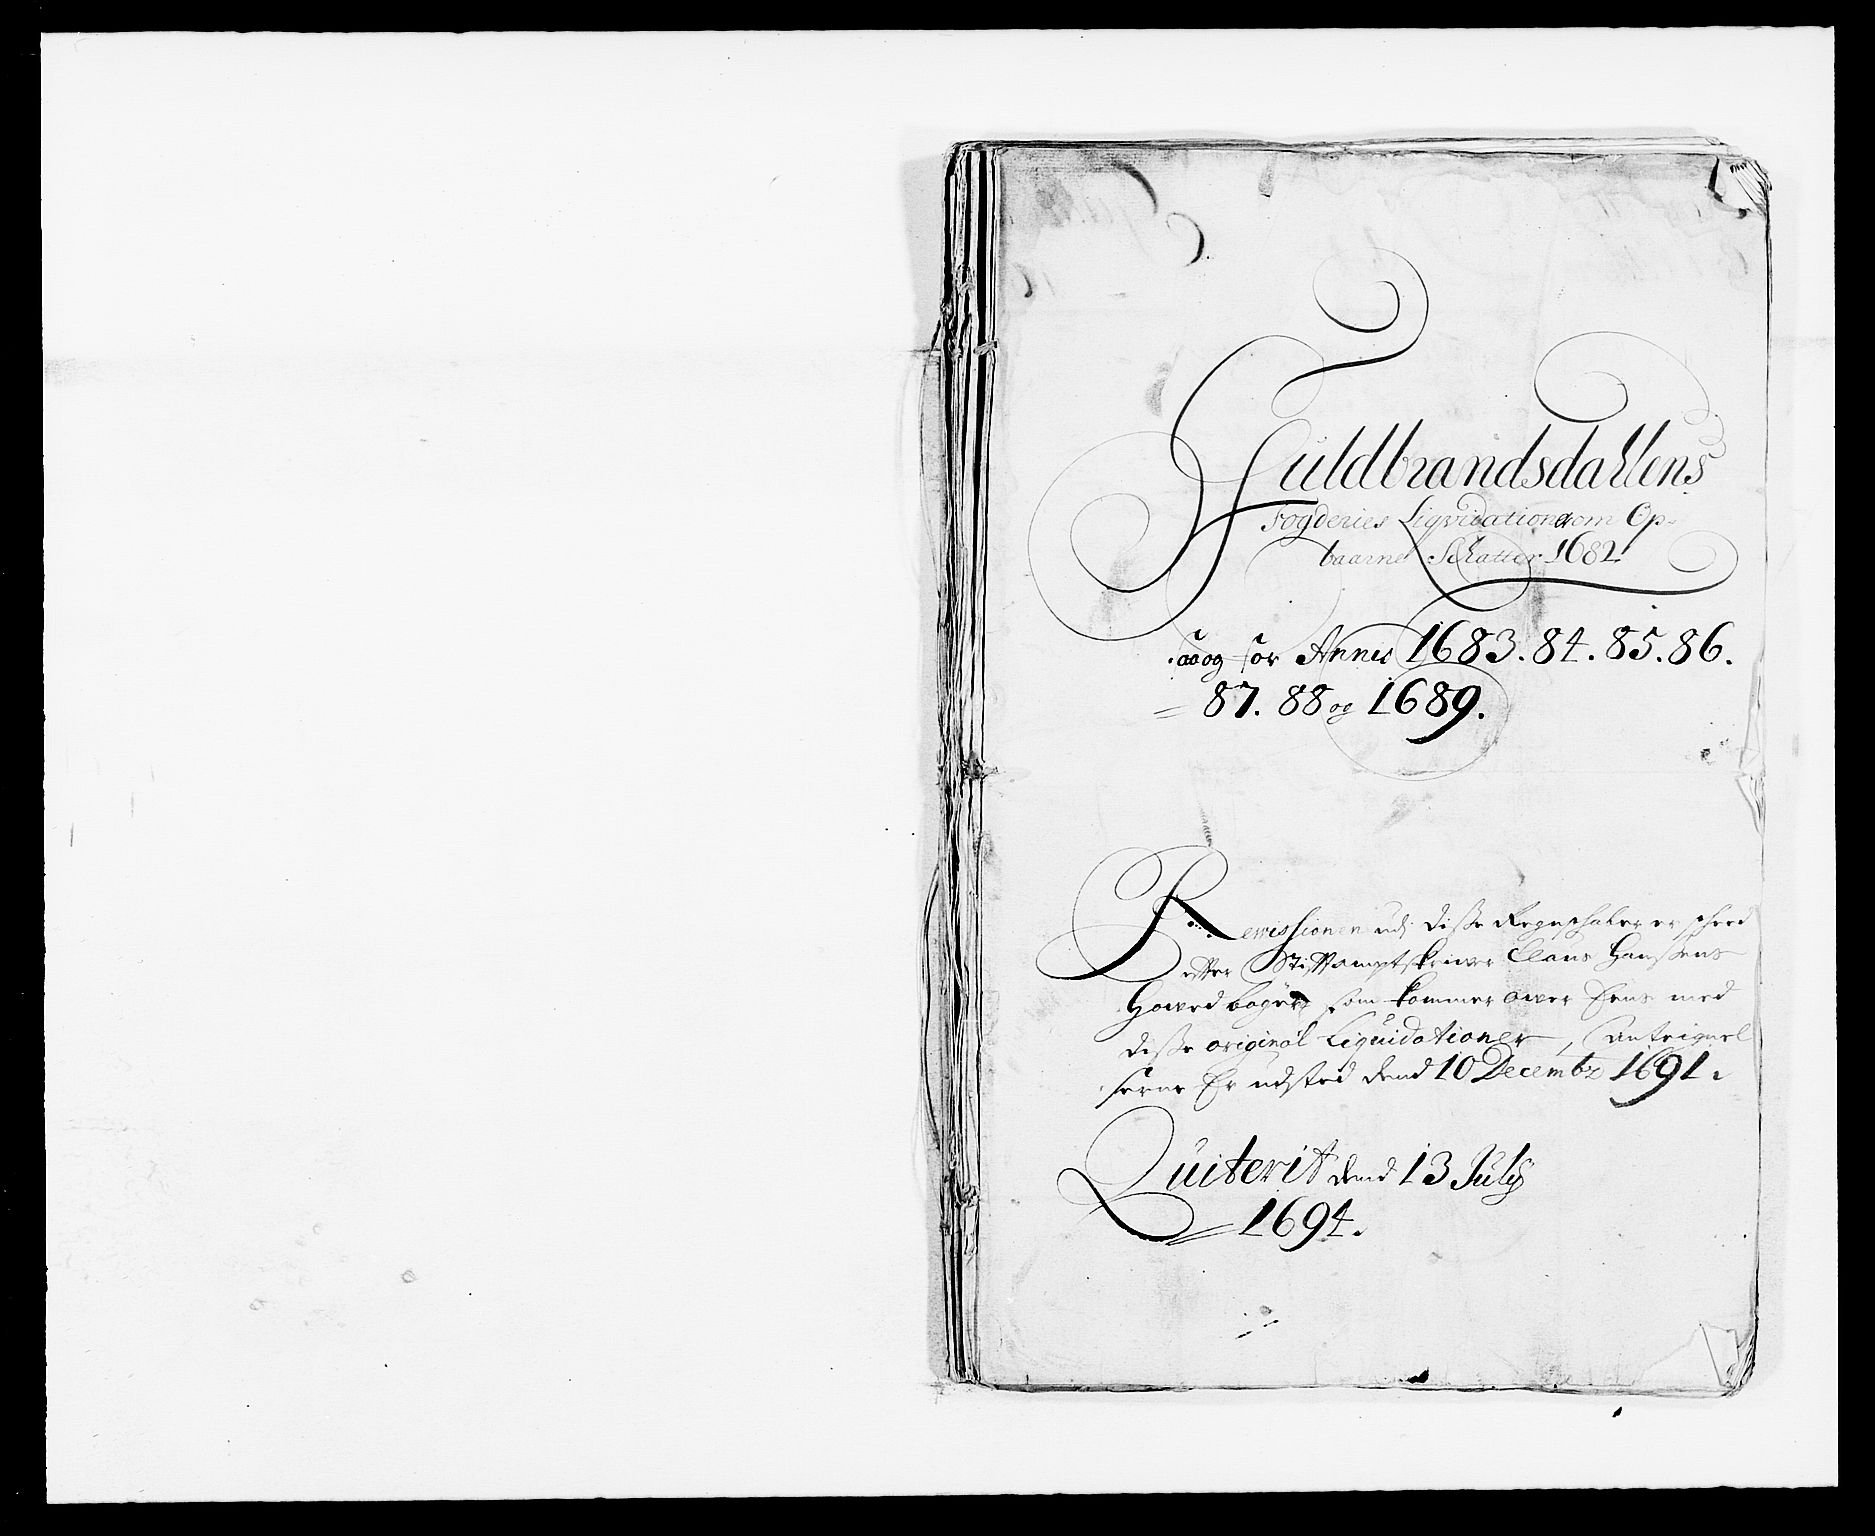 RA, Rentekammeret inntil 1814, Reviderte regnskaper, Fogderegnskap, R17/L1157: Fogderegnskap Gudbrandsdal, 1682-1689, s. 1